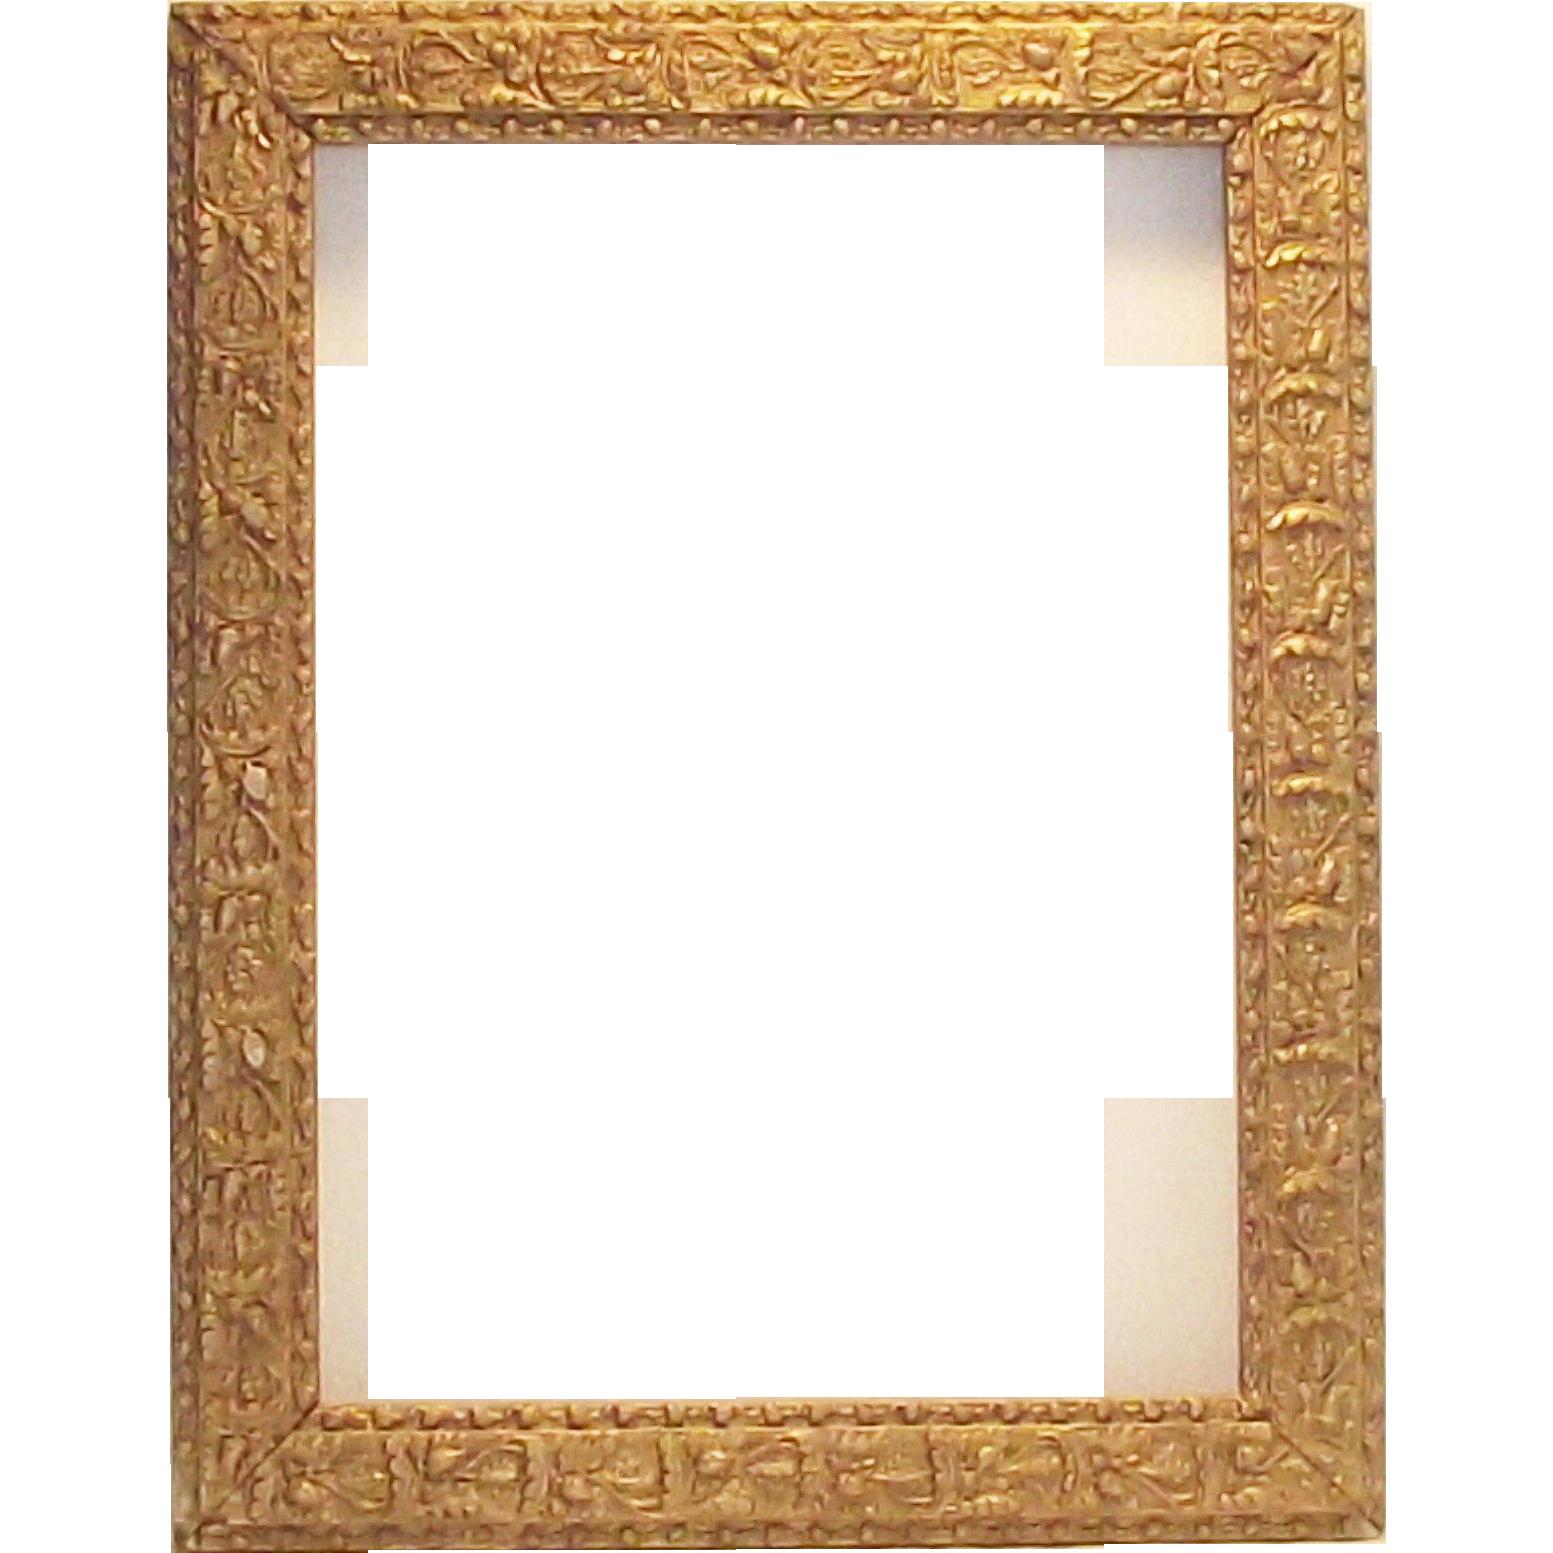 "Victorian Era Gesso Gilt Frame Acorns and Oak Leaves 16"" x 12.5 ..."